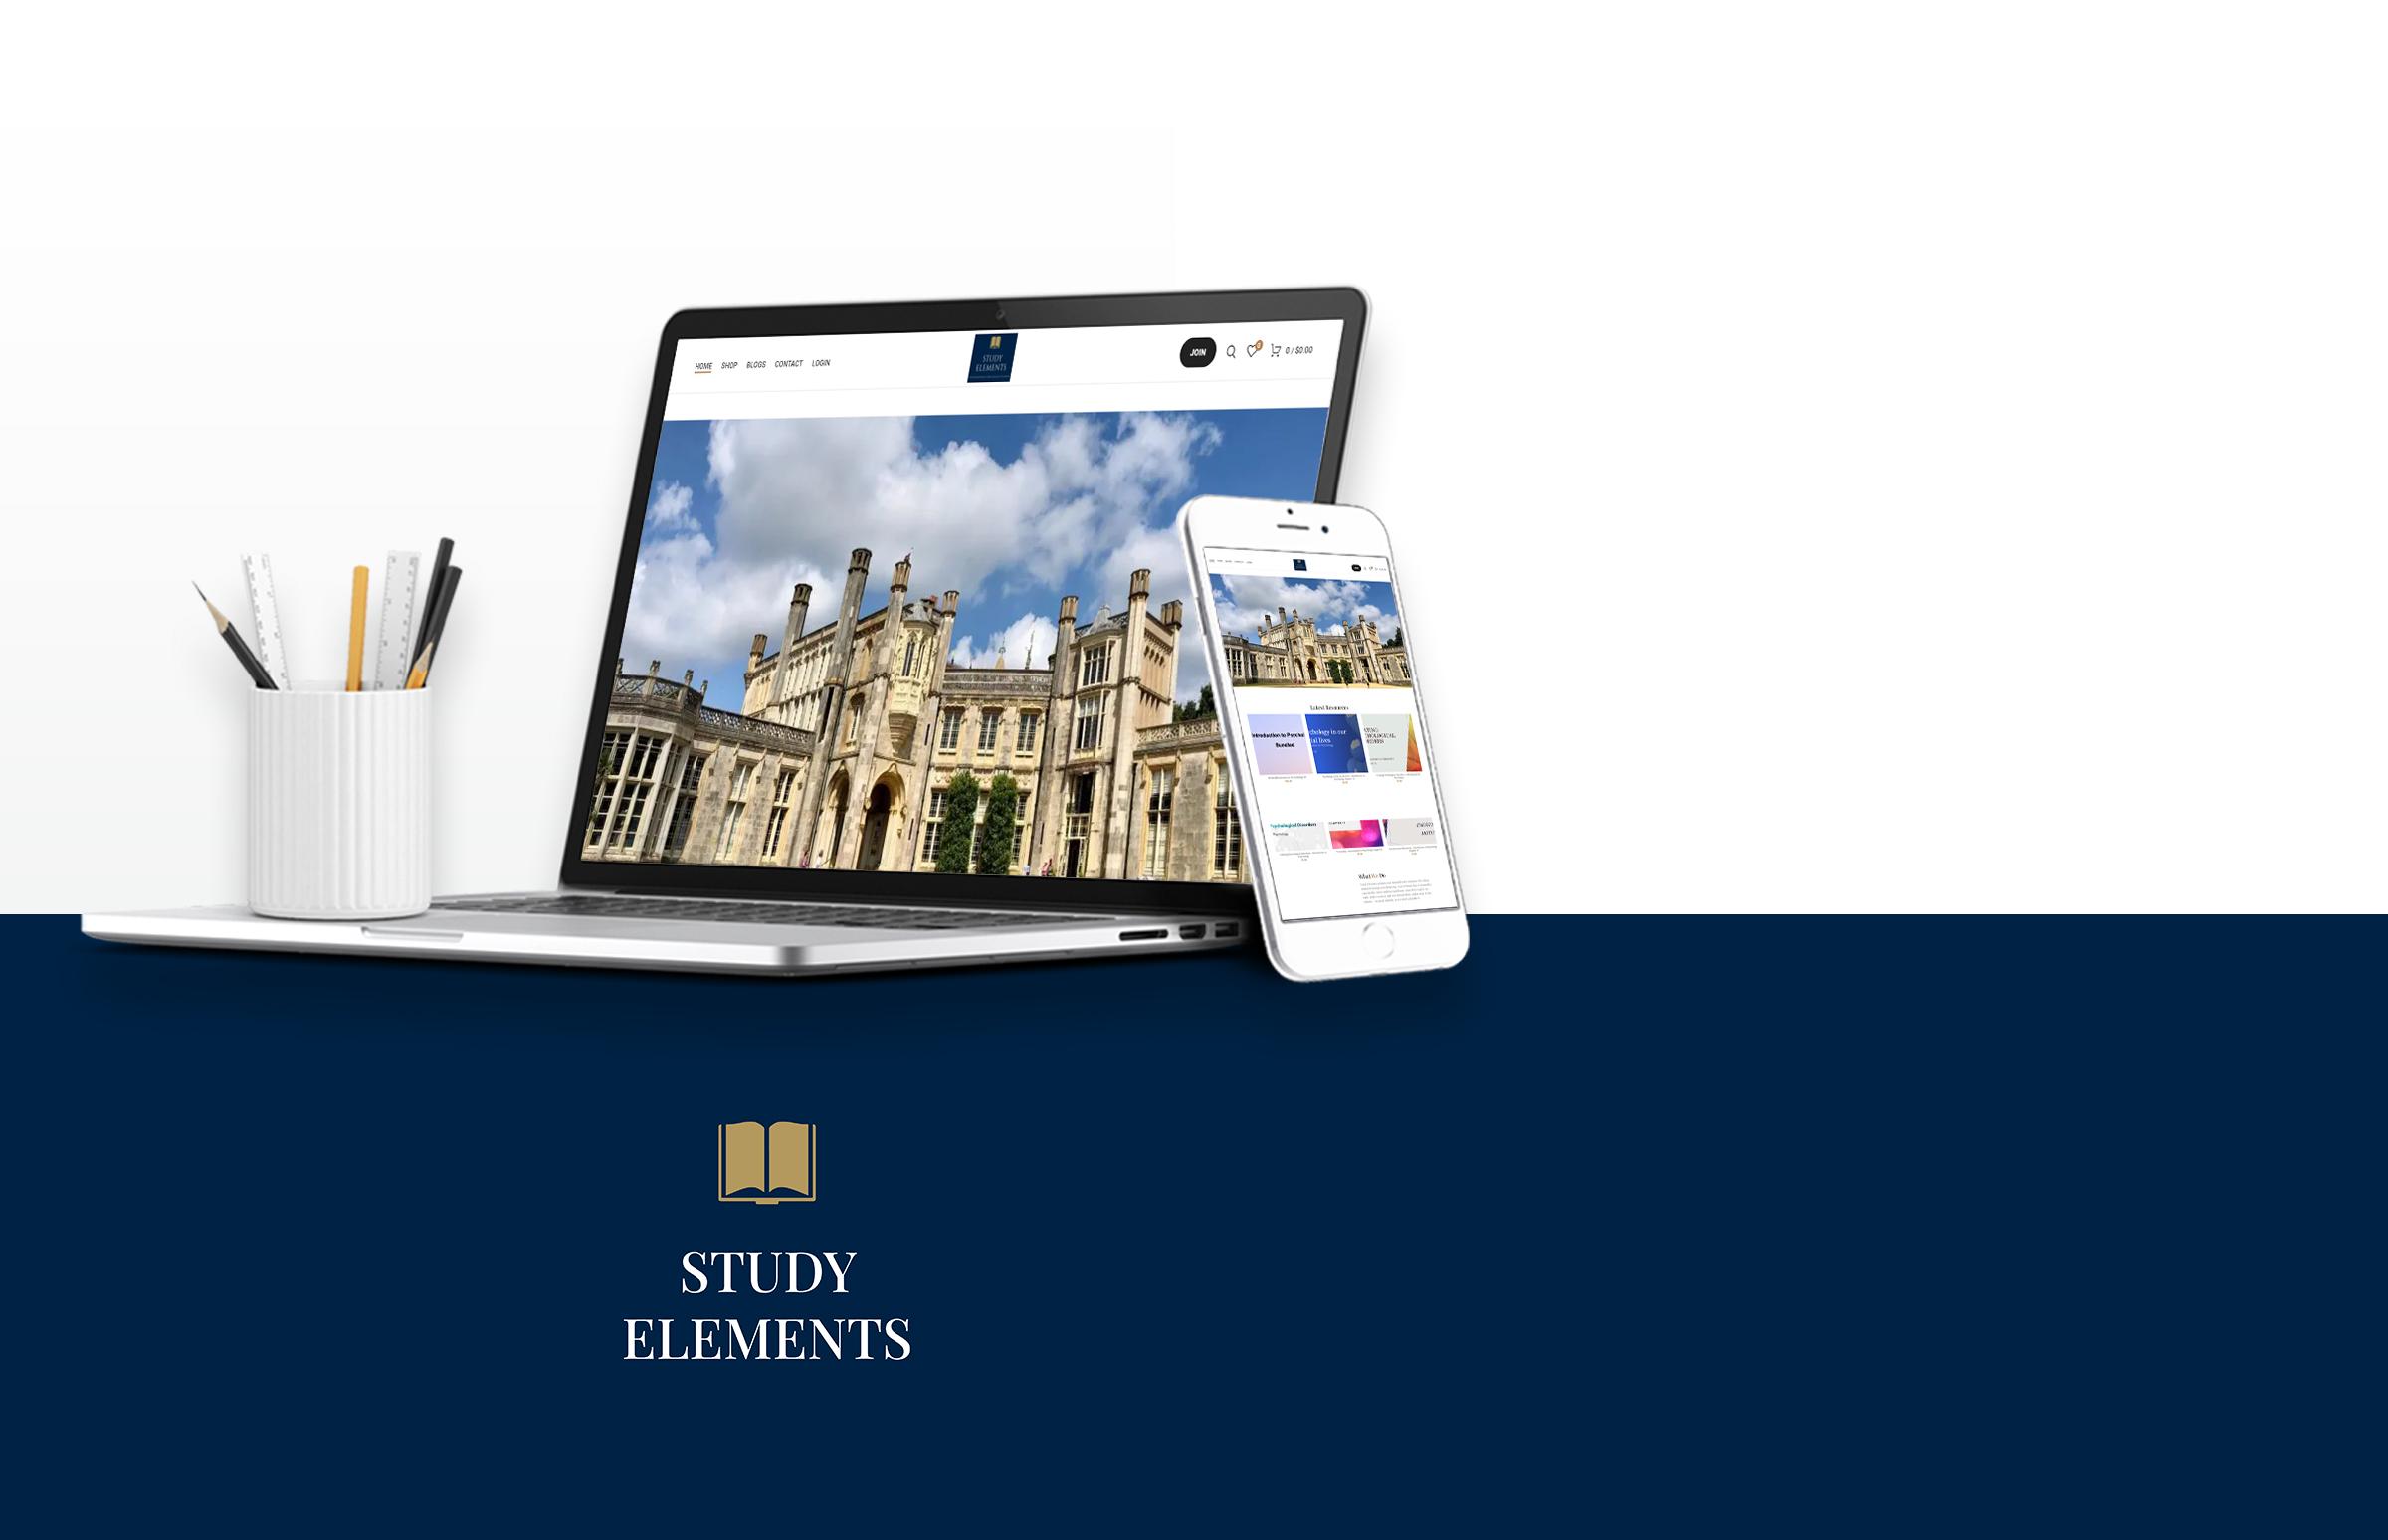 Education Platform Study Elements Marketplace blog